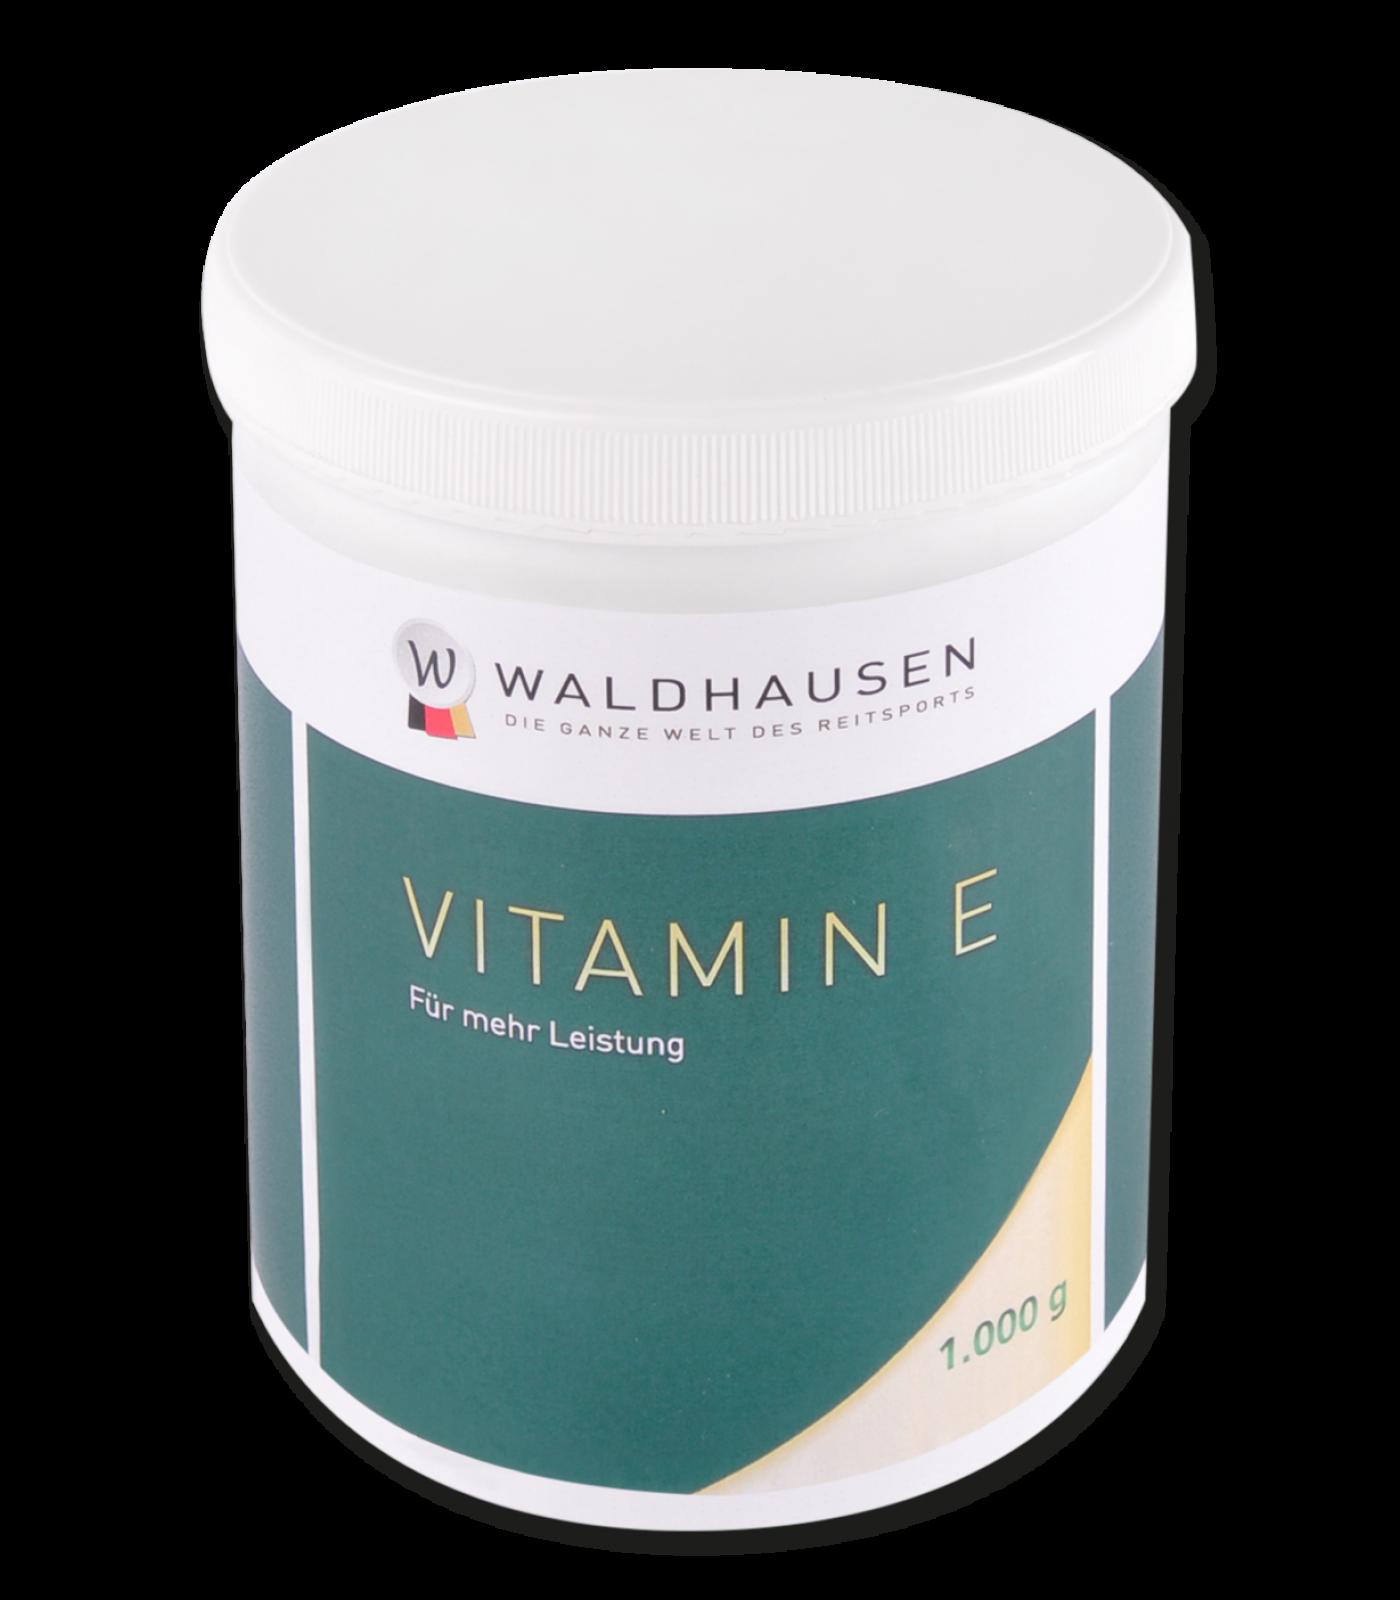 Vitamine E Waldhausen